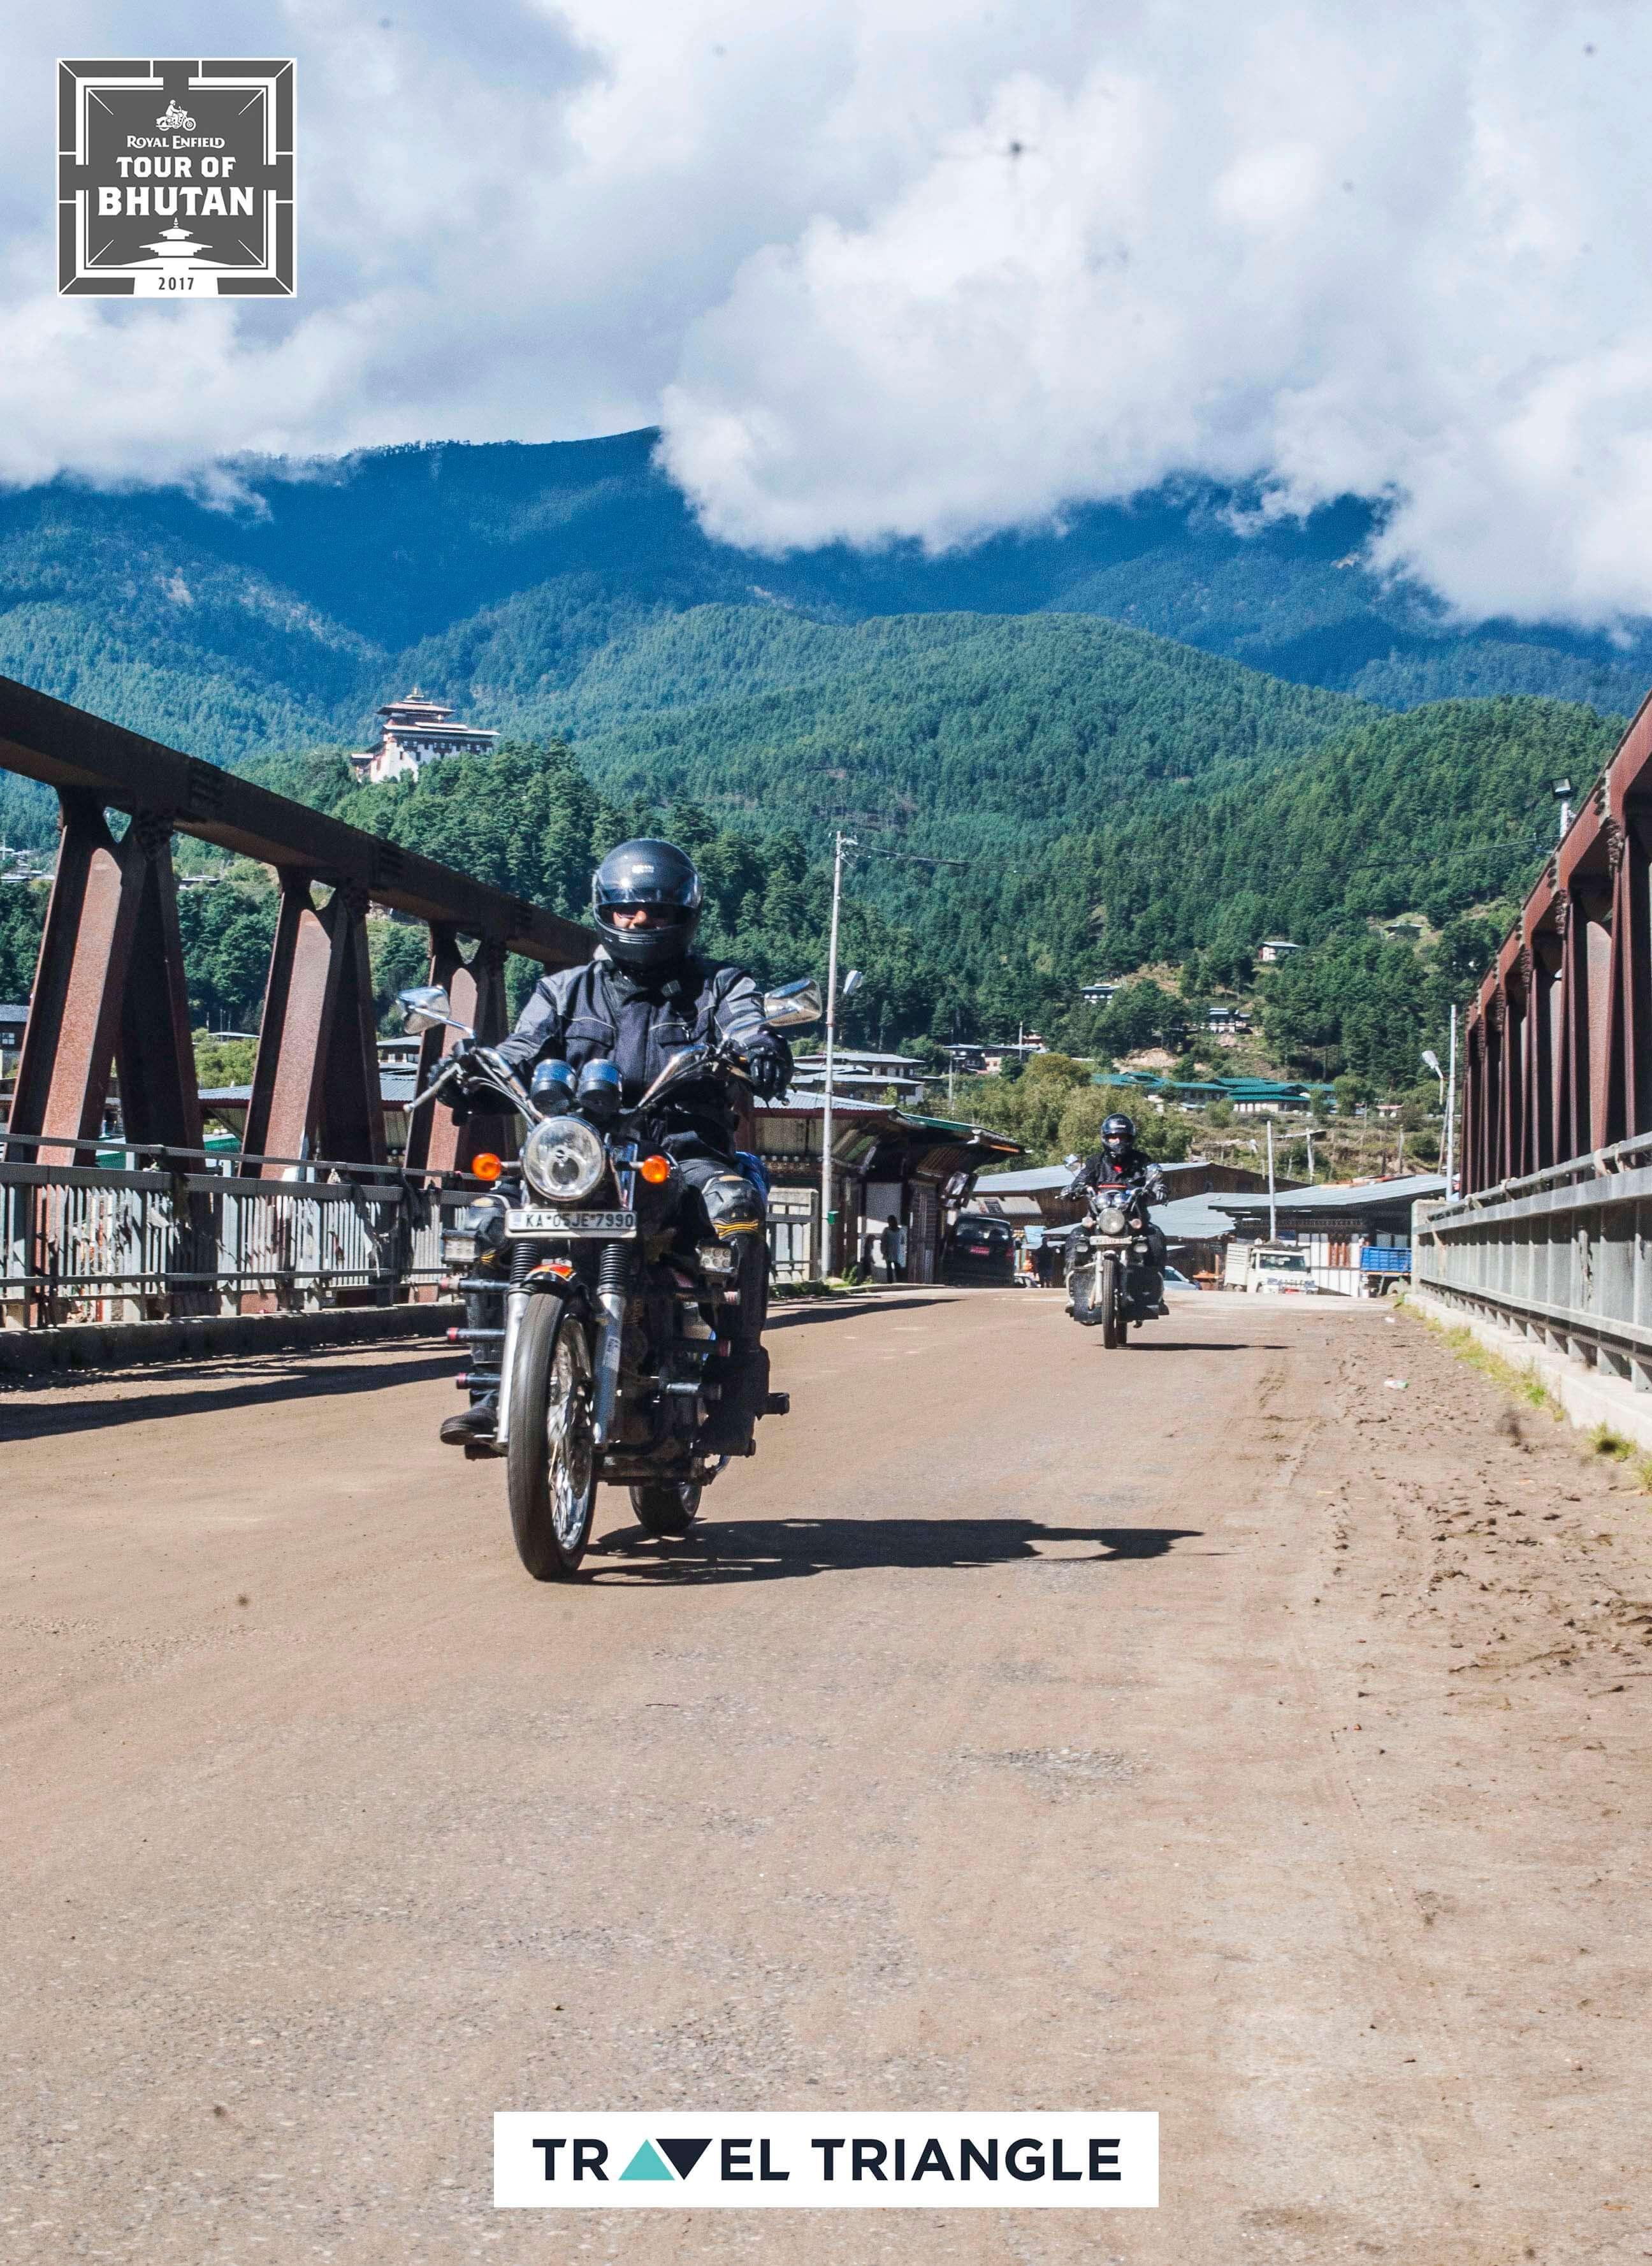 Bumthang to Mongar: riding over a bridge to mongar